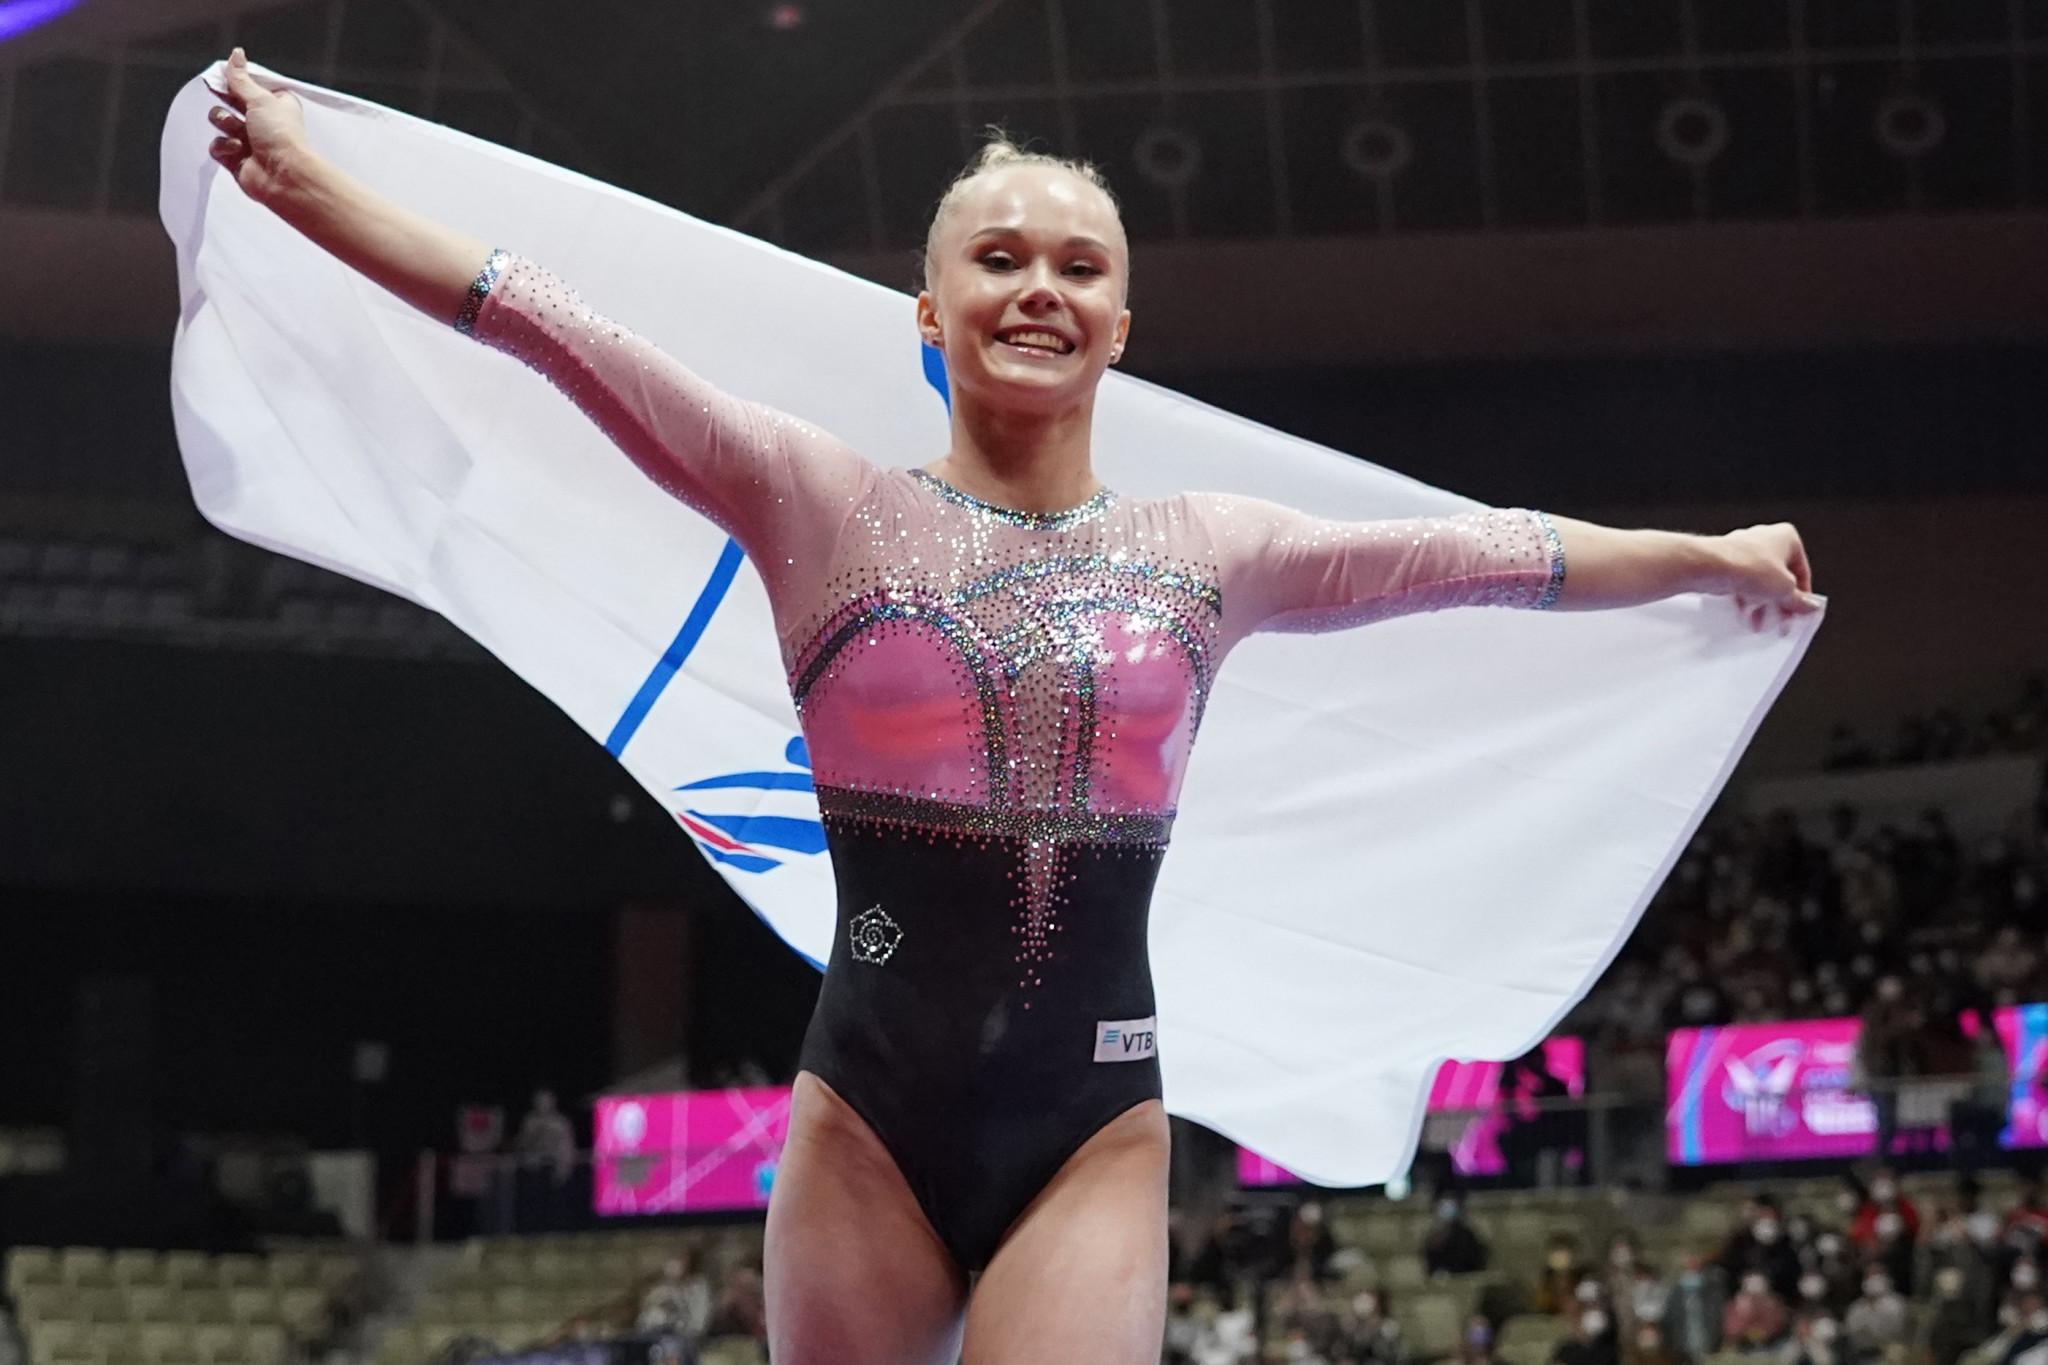 Melnikova wins women's all-around gold at Artistic Gymnastics World Championships